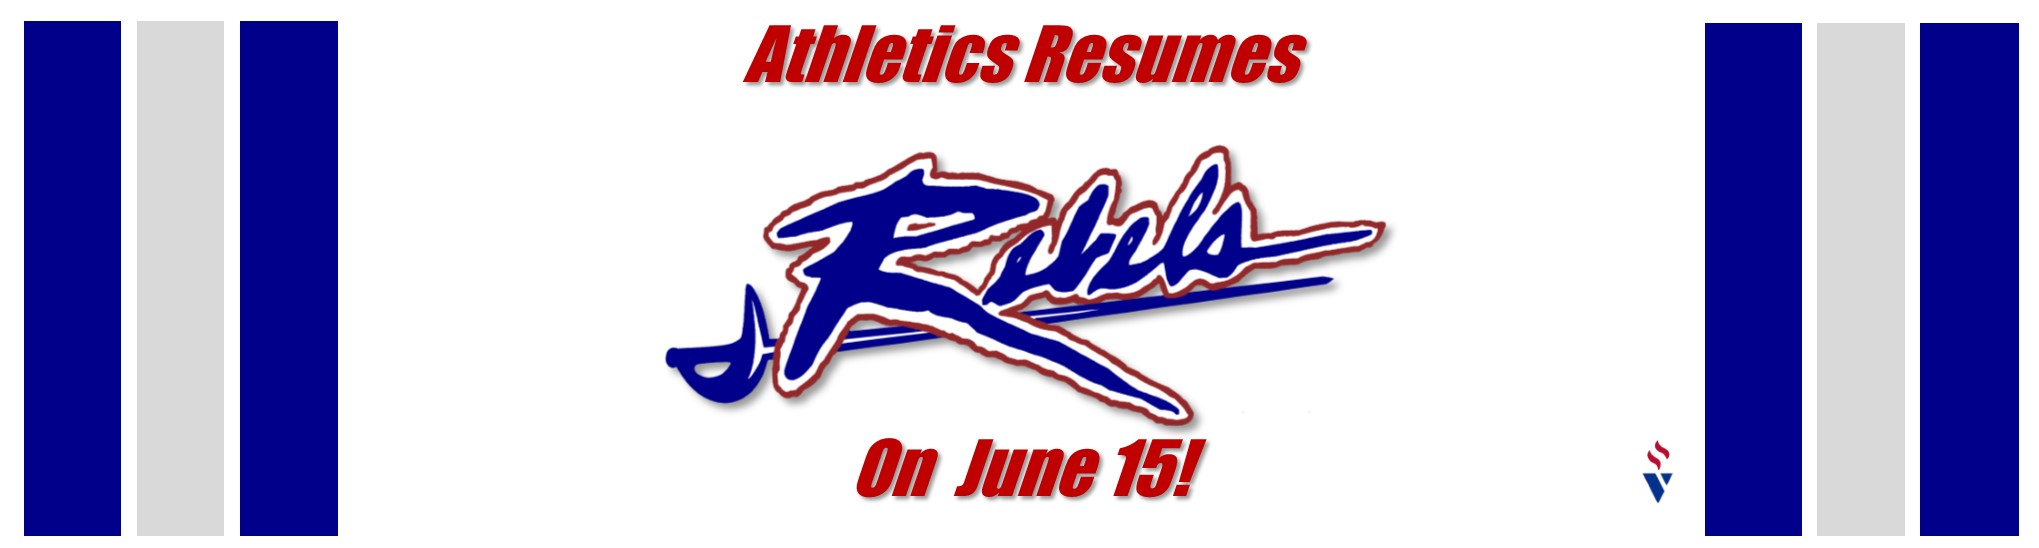 Summer workouts begin on June 15